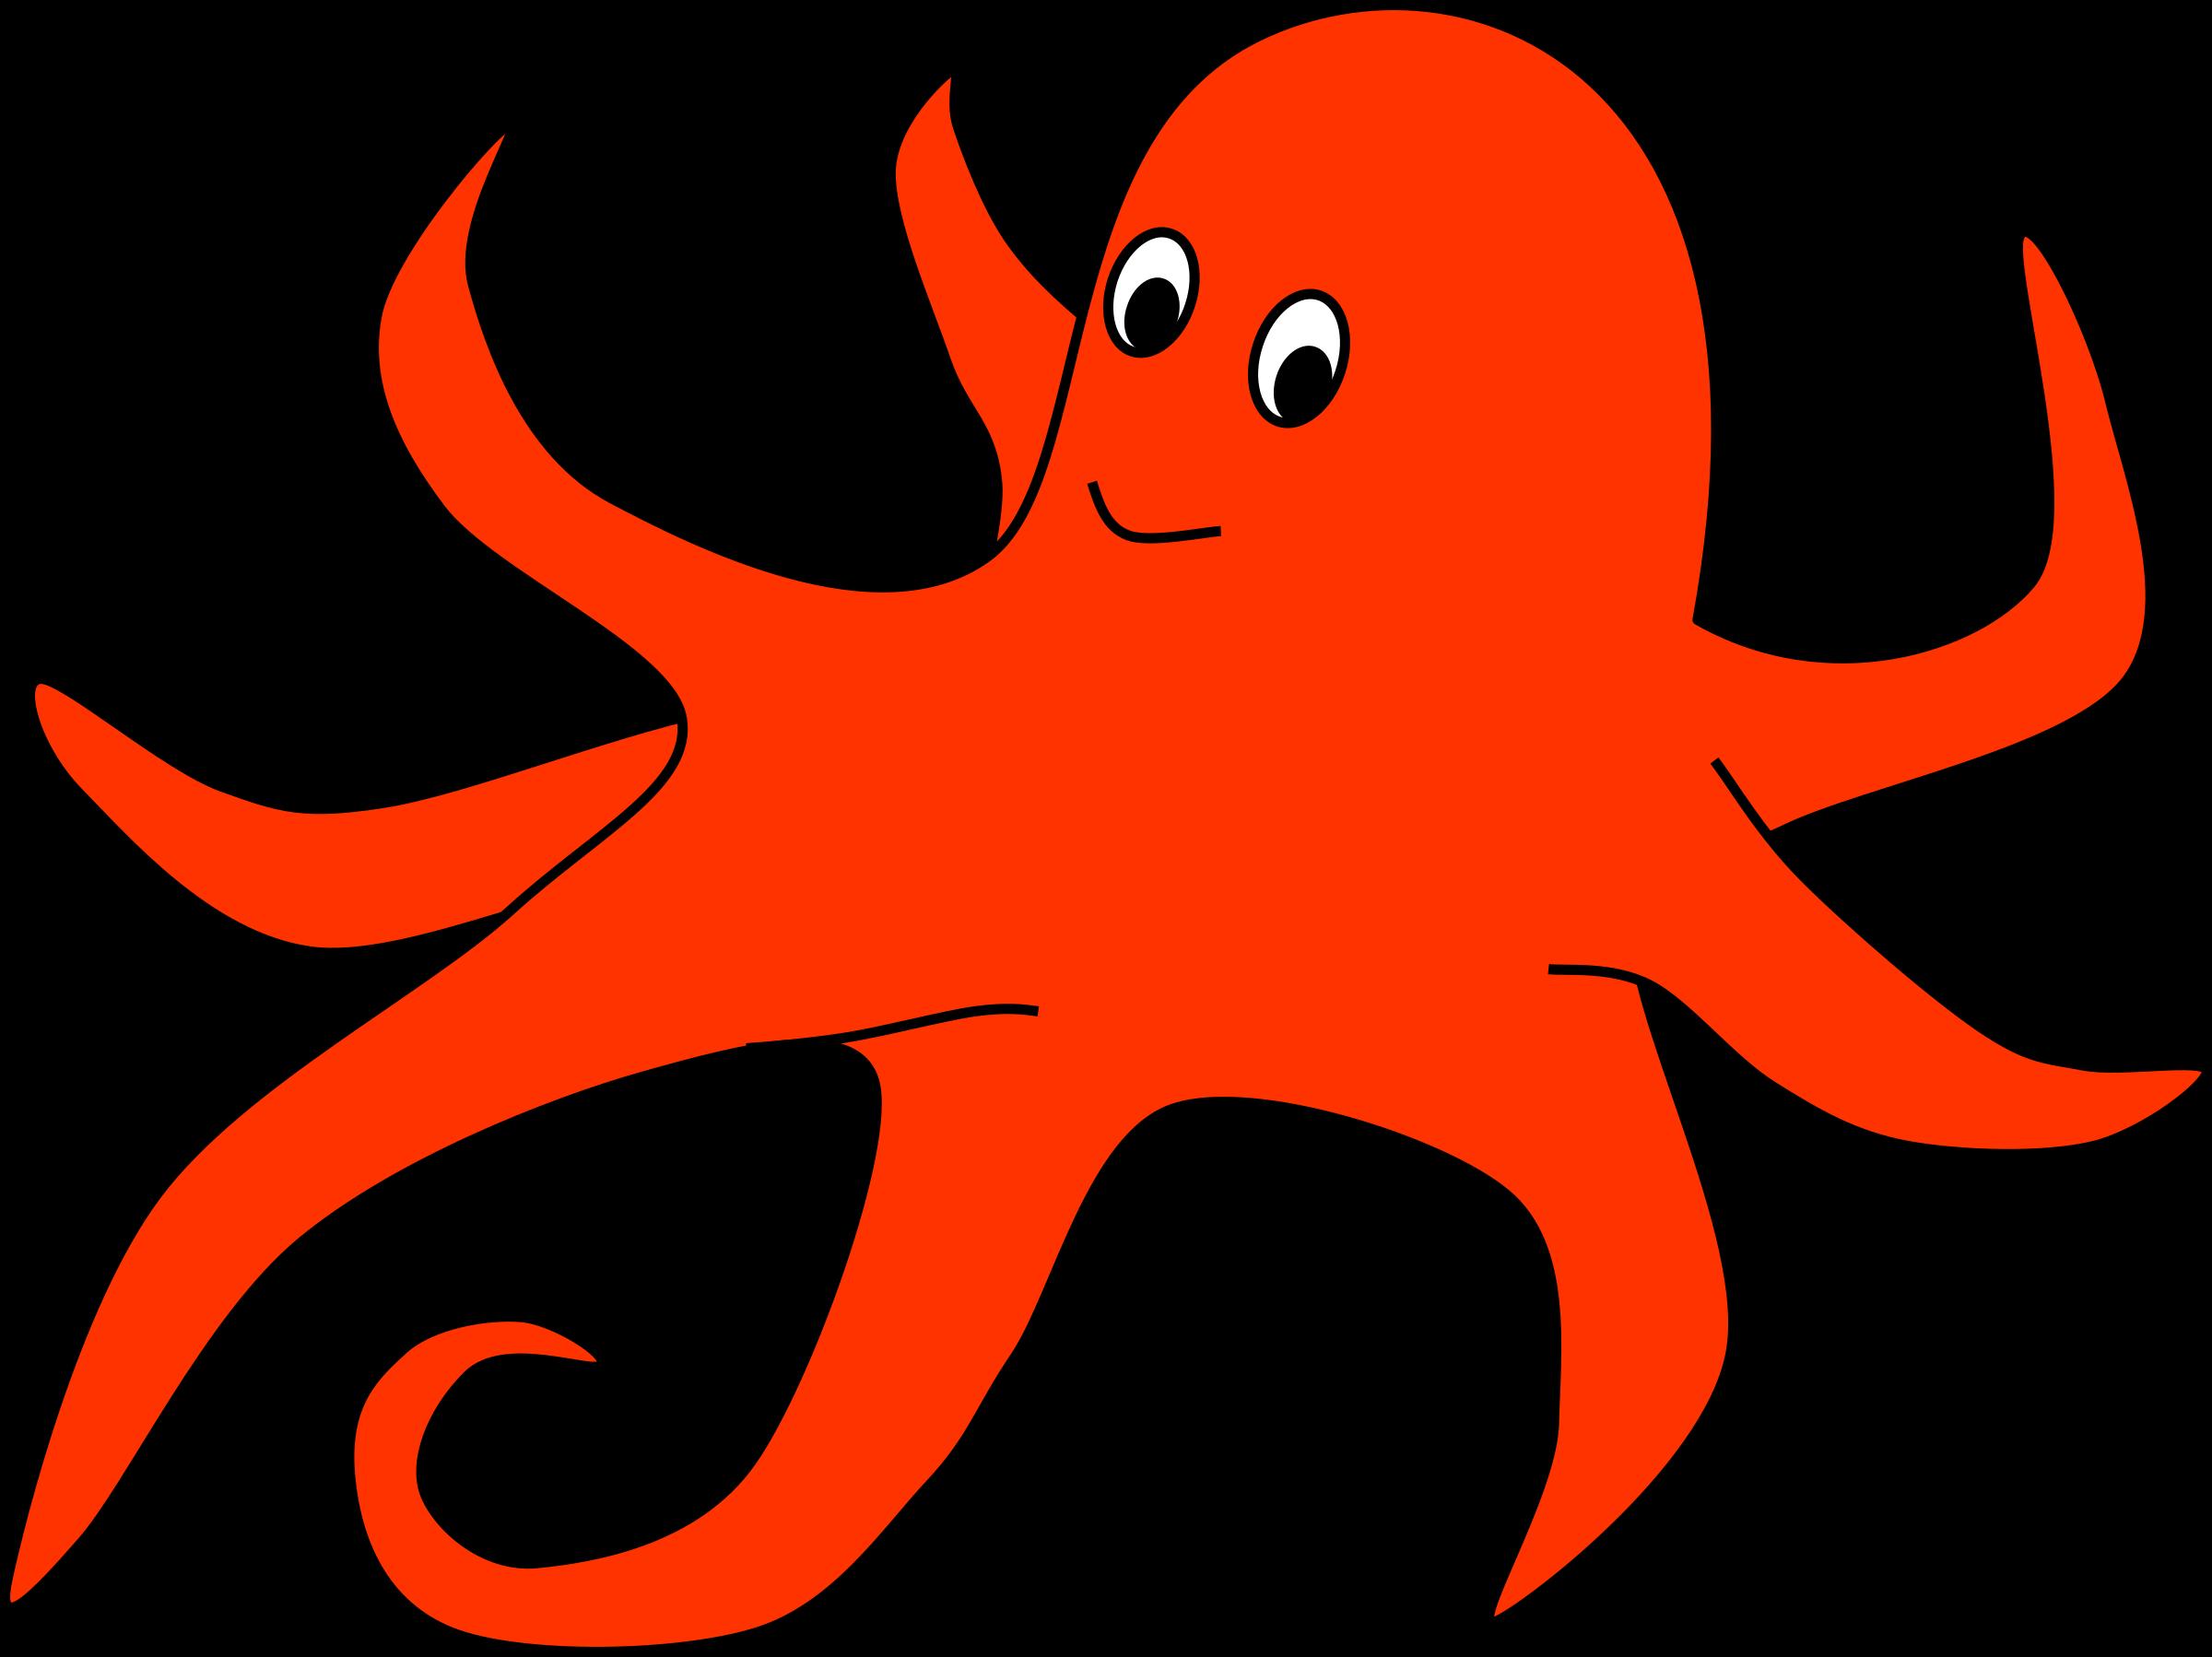 Oval of orange big. Clipart octopus teal